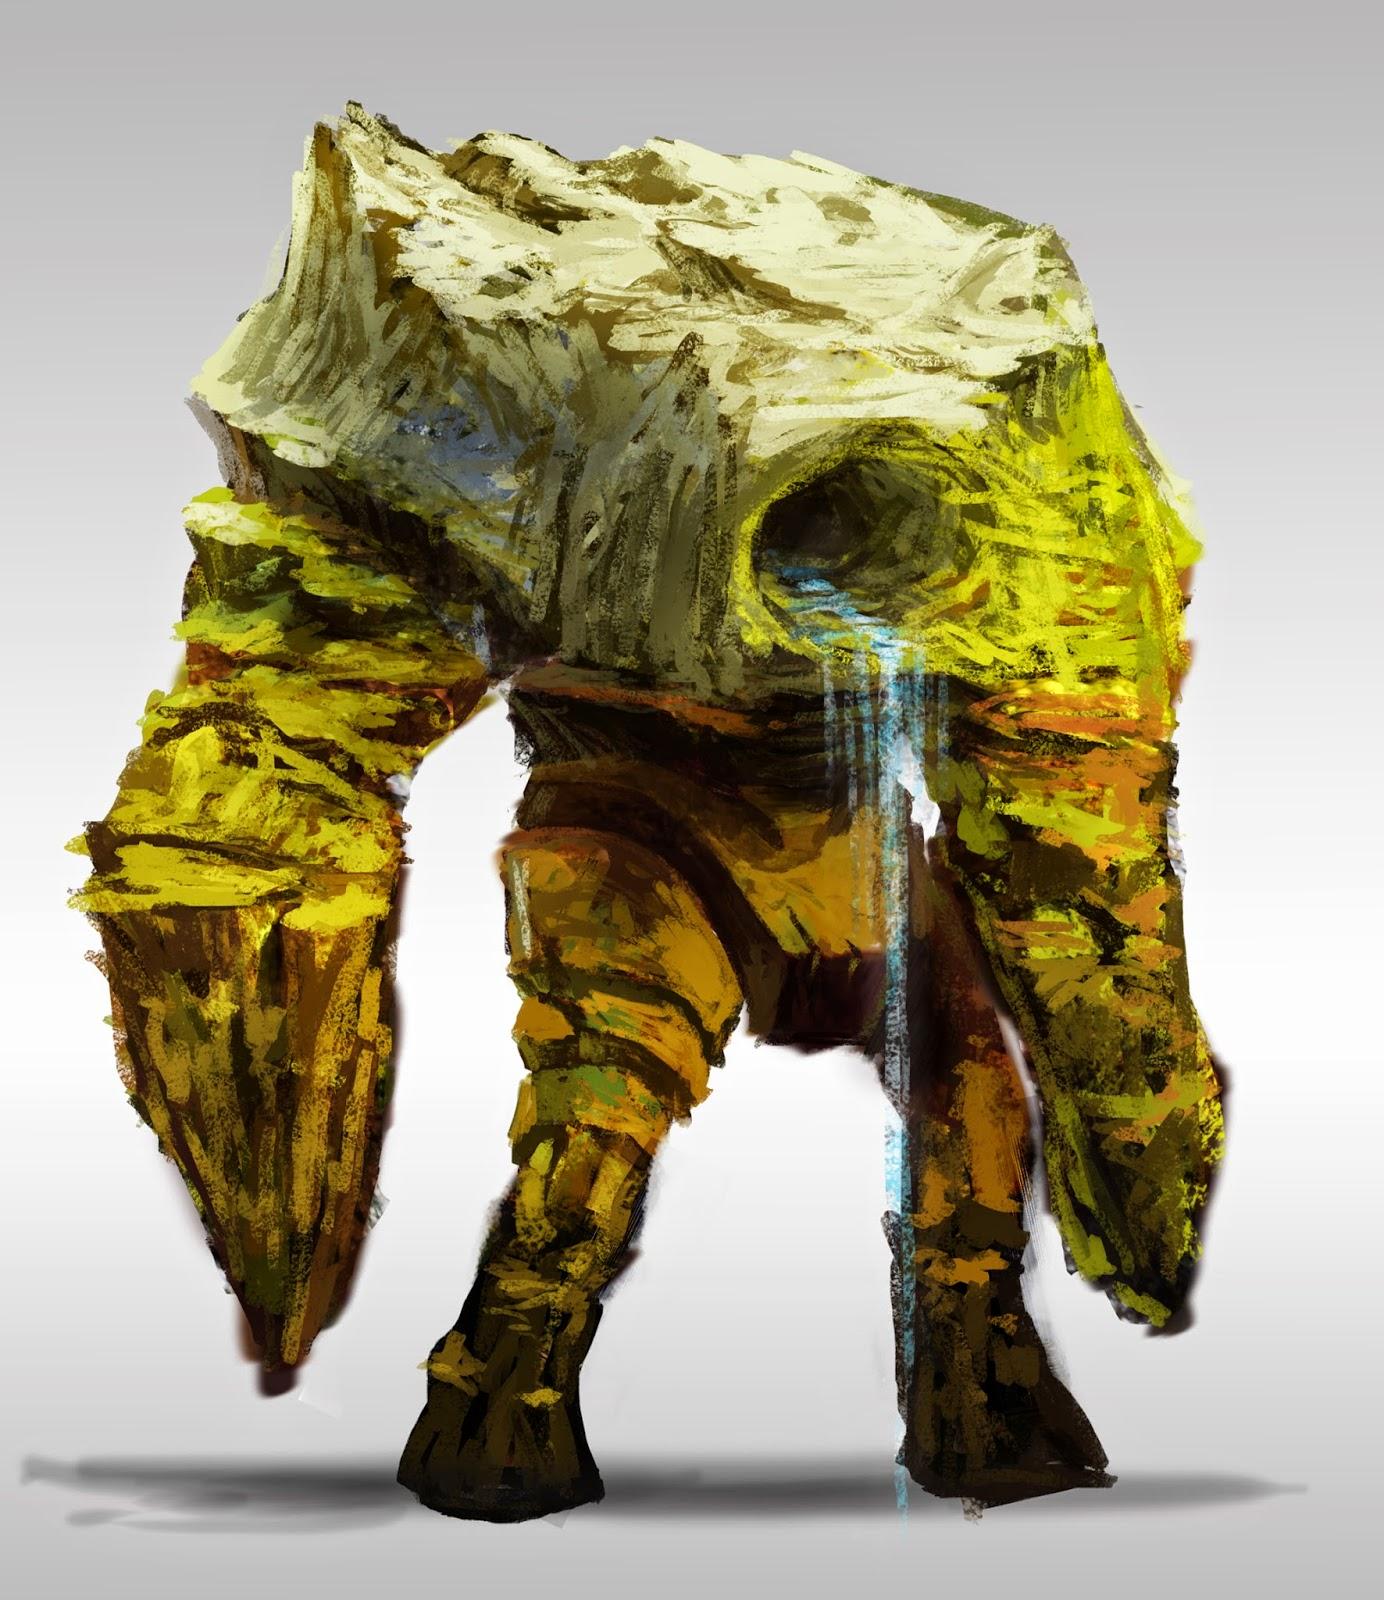 douglas deri,concept art,mountain, mountain creature, floresta, game, sci-fi, spirit of forest,douglas deri,how to paint, photoshop brushes, brushes, how to draw, como desenhar,